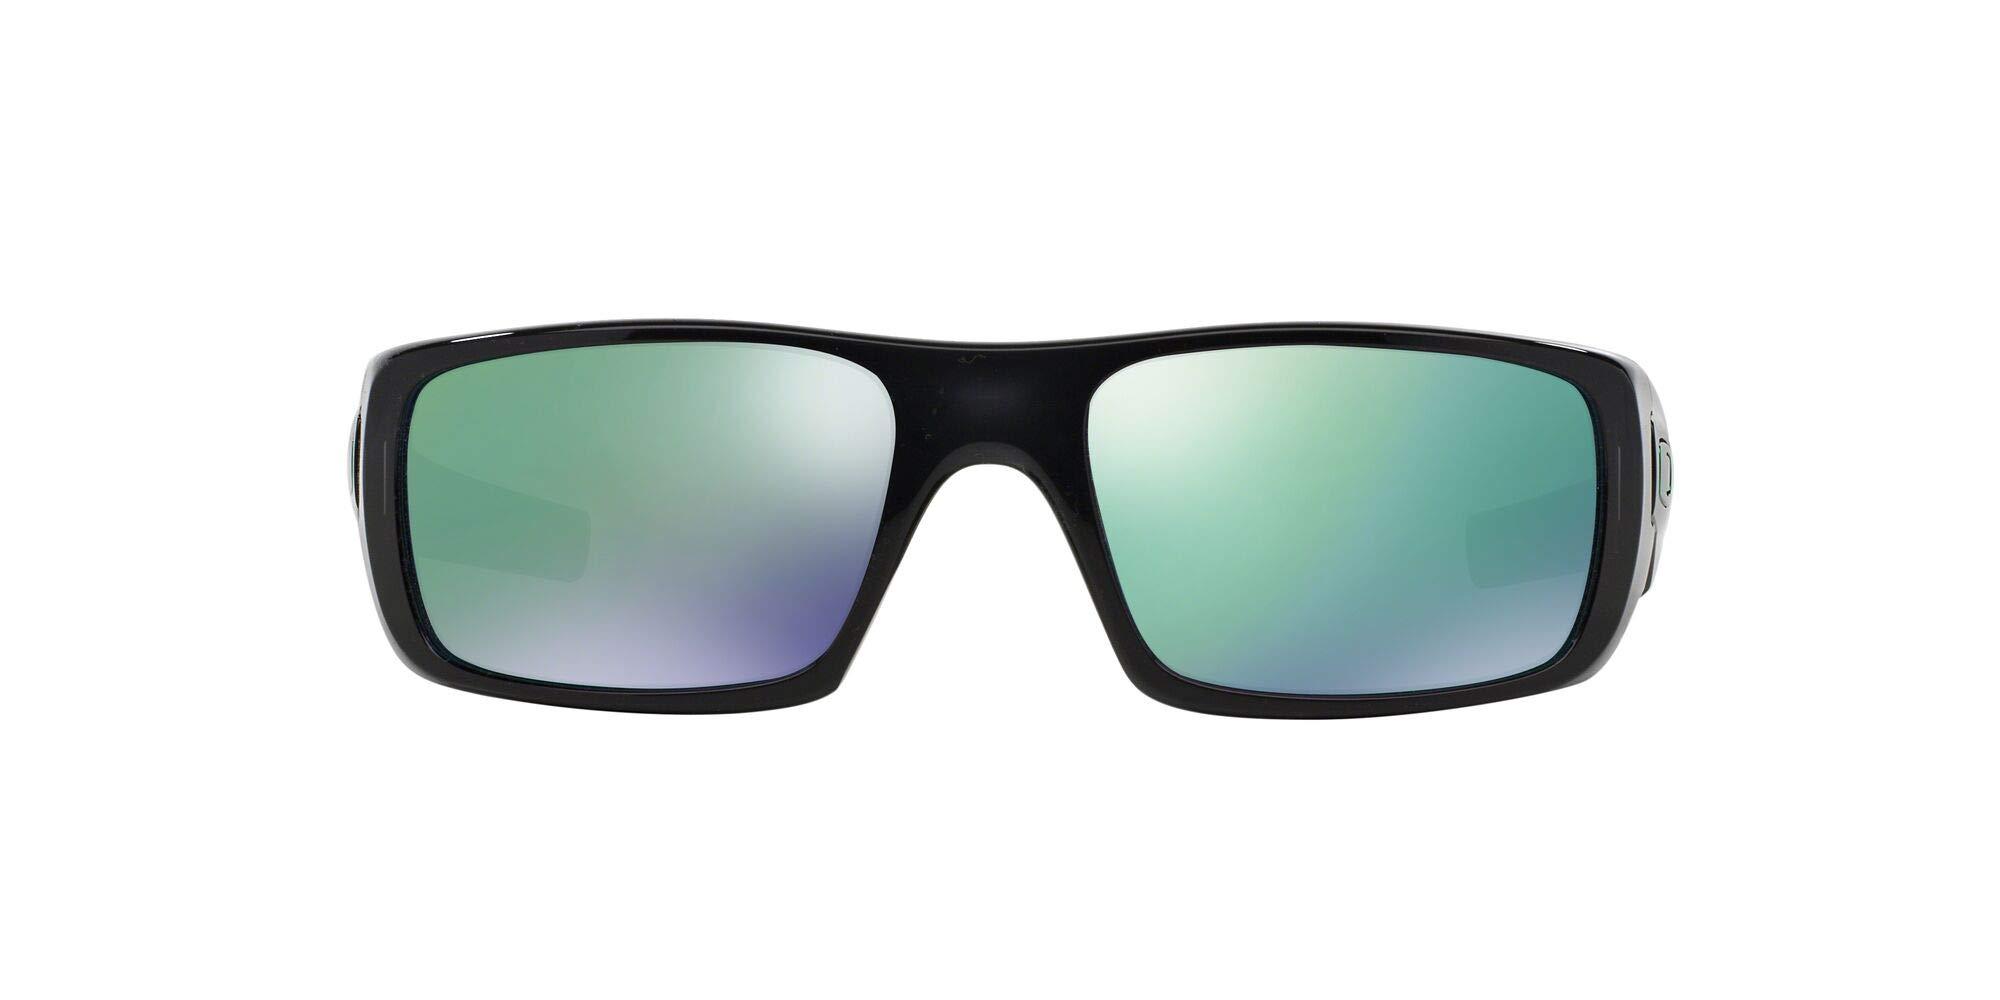 Men's Oo9239 Crankshaft Rectangular Sunglasses